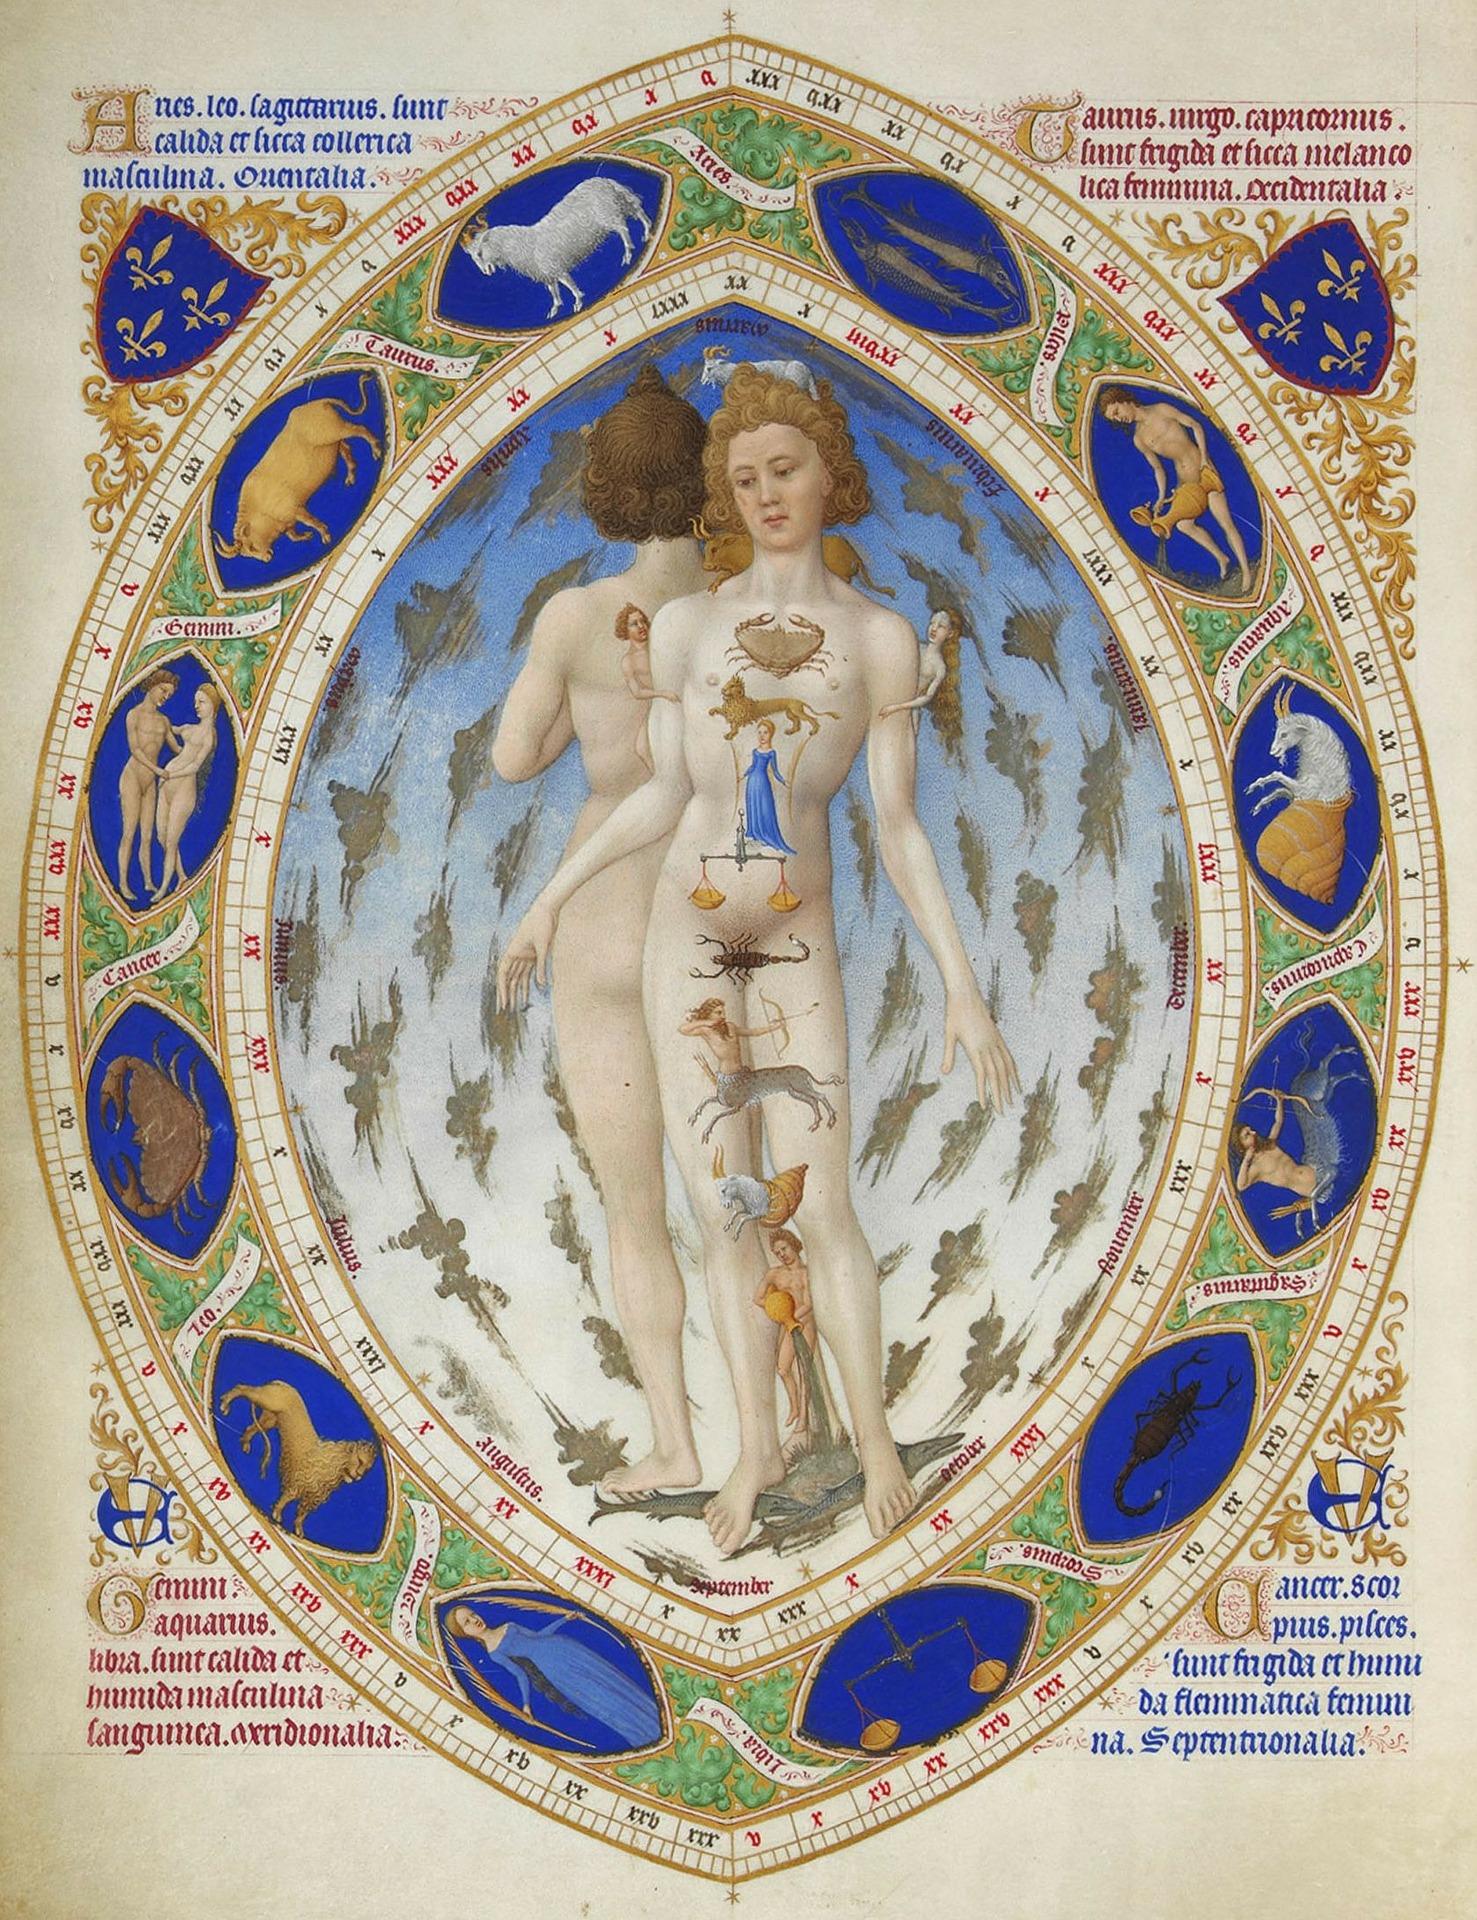 Zodiac maps – the human body